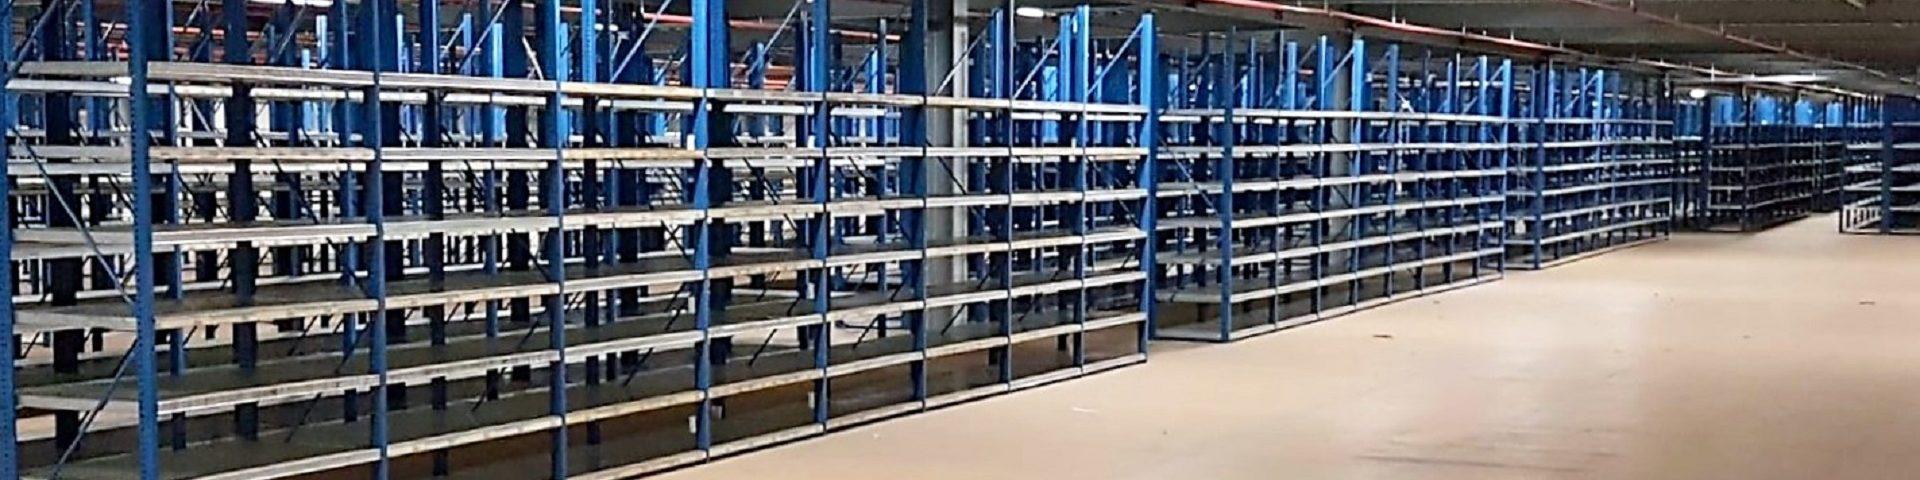 Warehouse VIMdscr nov 2018